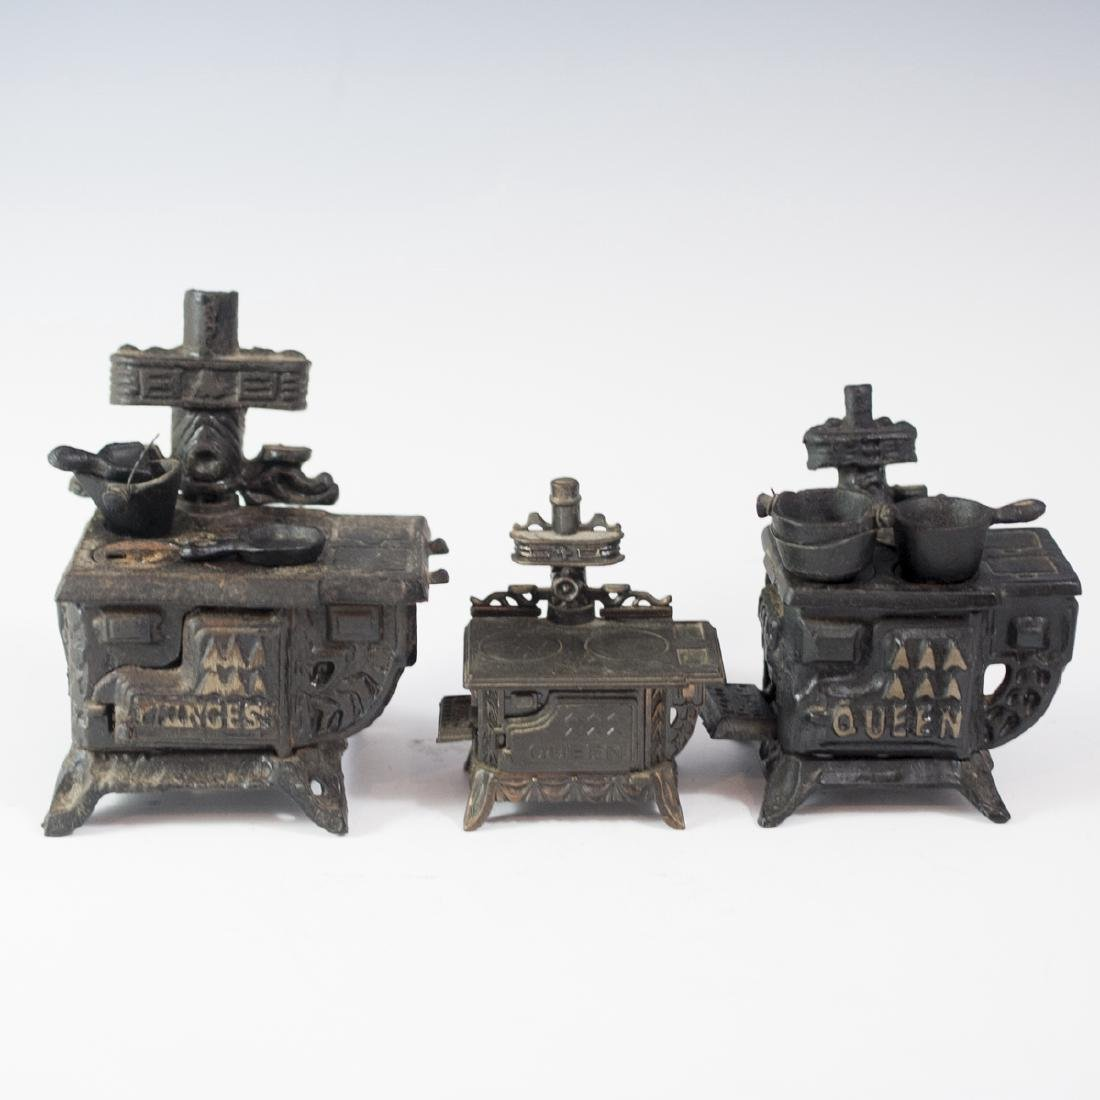 Queen Cast Iron Miniature Salesman Stoves